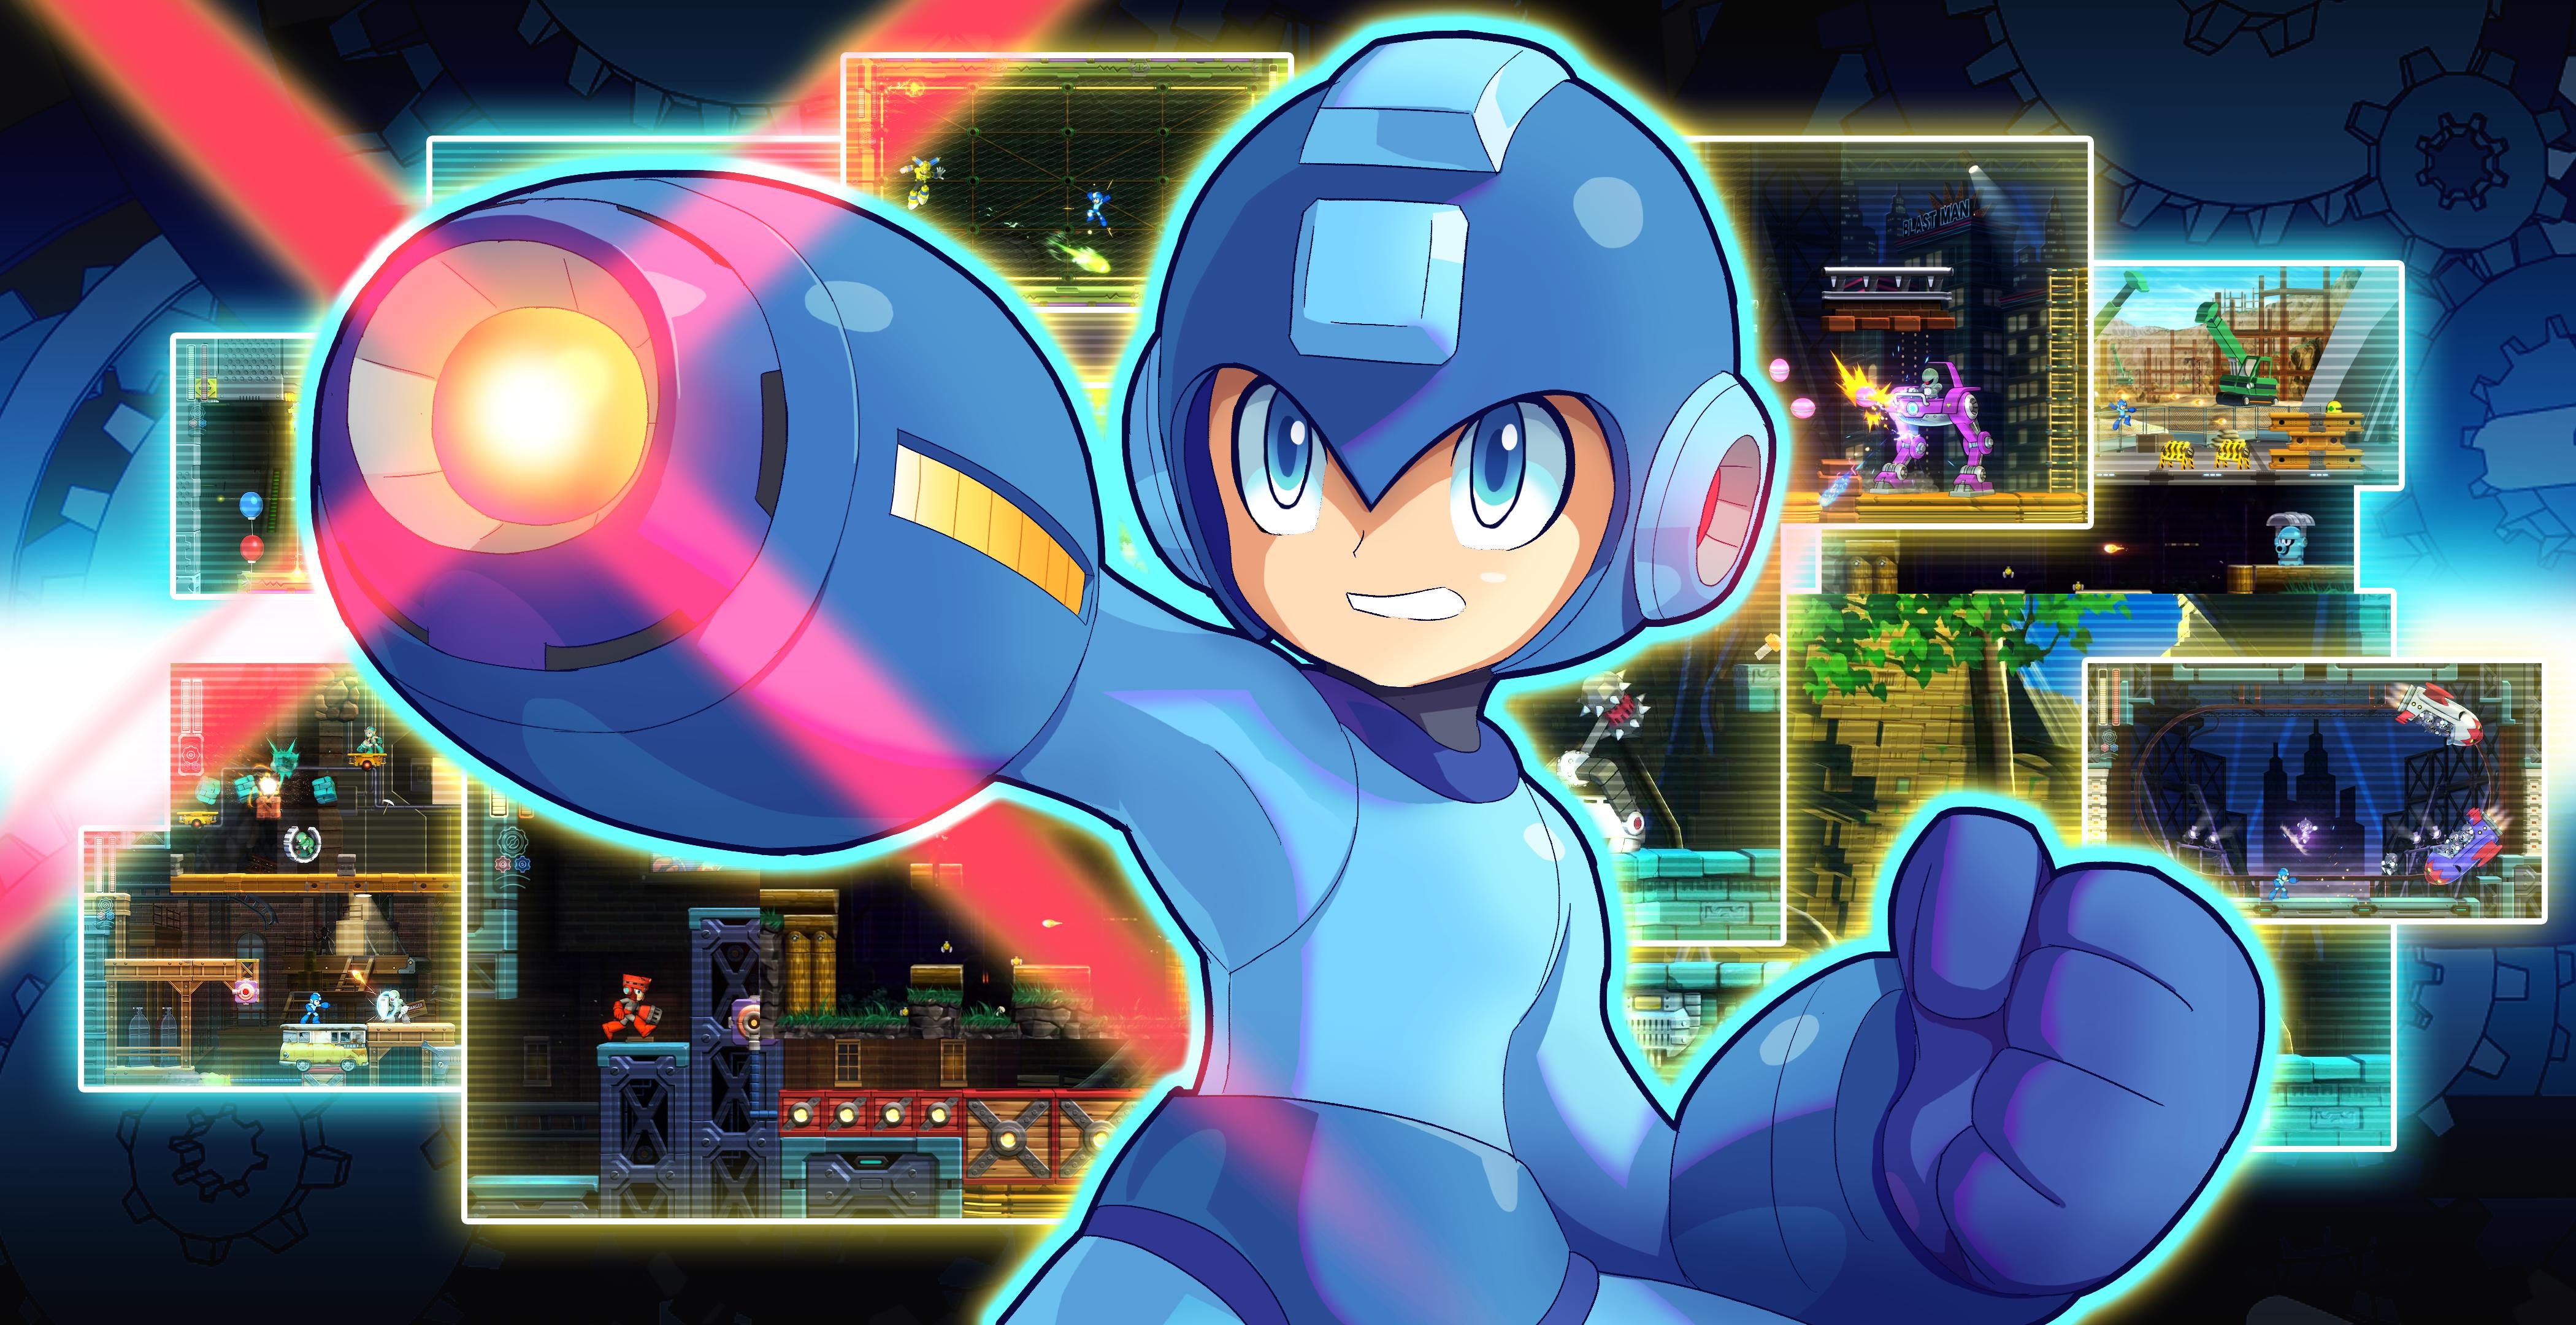 Mega Man Mega Man 11 Wallpaper - Resolution:4200x2160 - ID ...